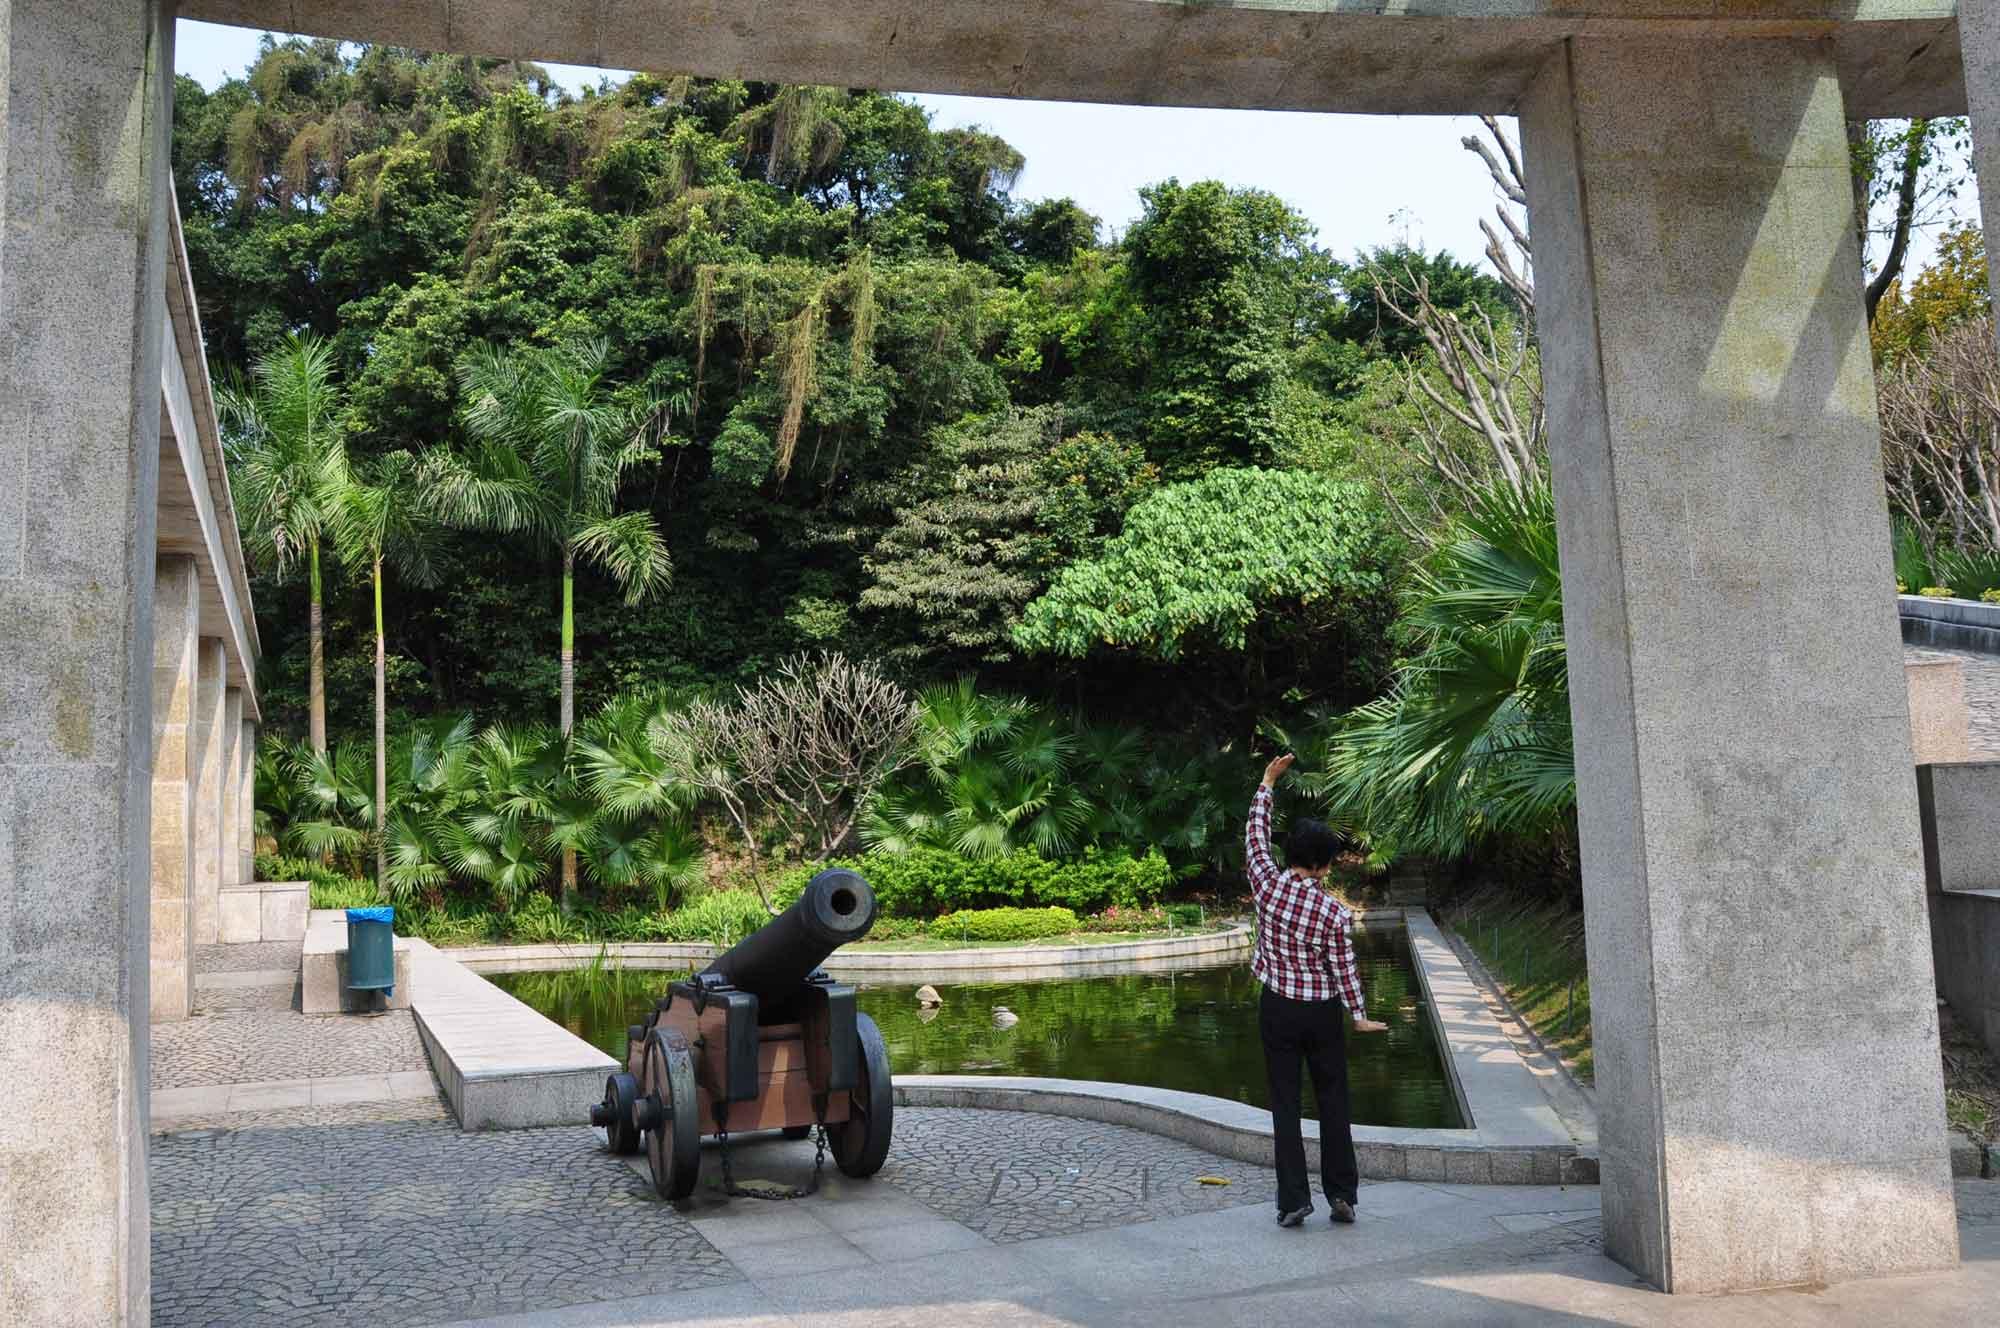 Mong Ha Park cannon